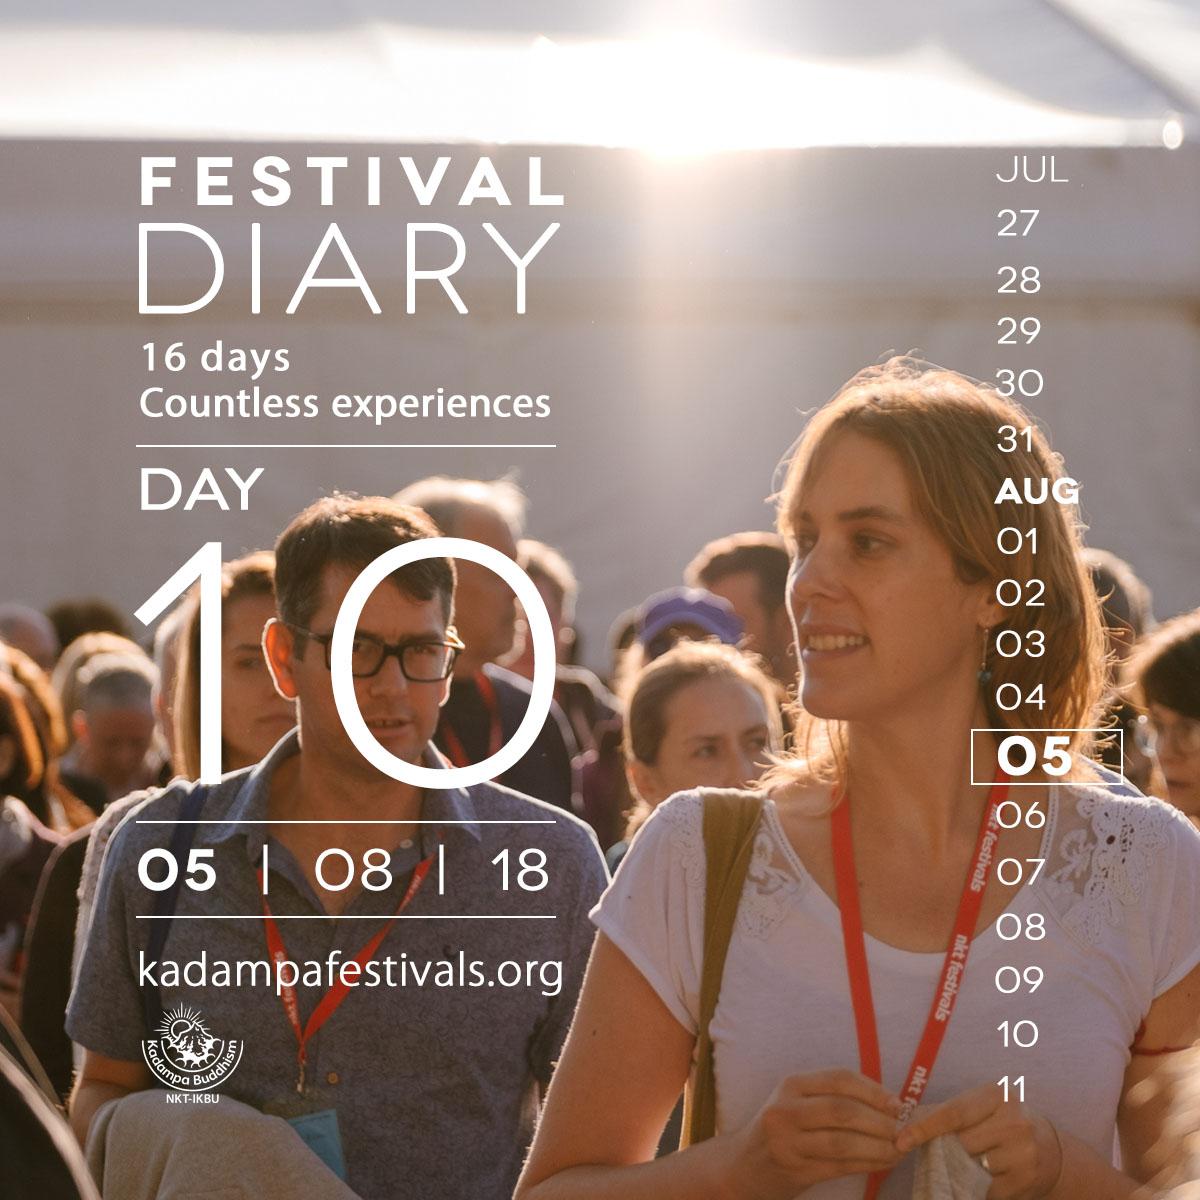 2018-07-26-festival diary-10-m